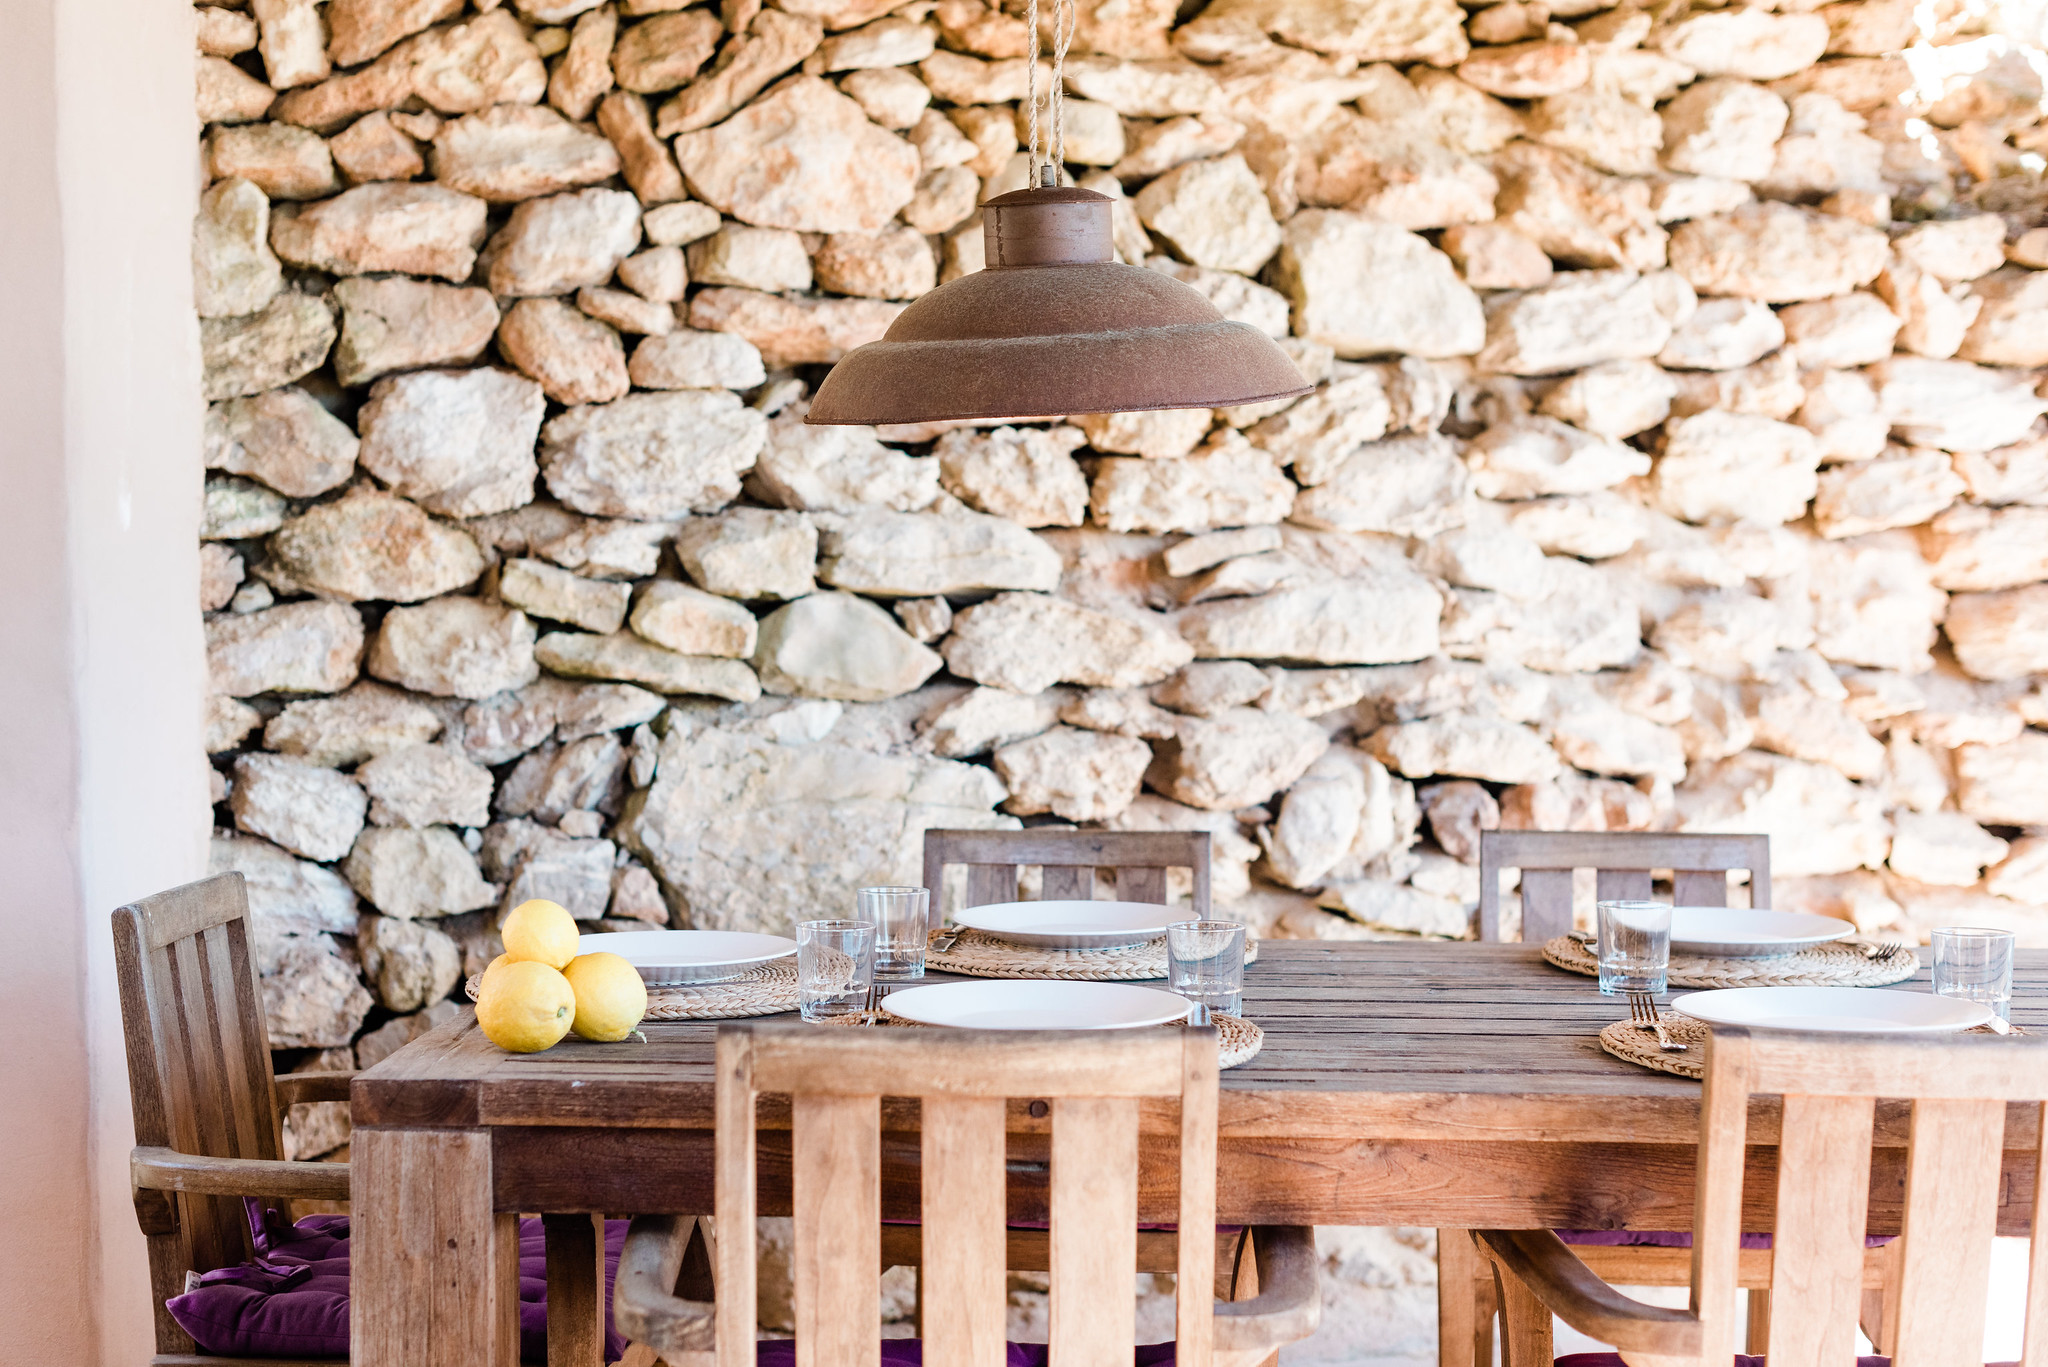 https://www.white-ibiza.com/wp-content/uploads/2020/06/white-ibiza-villas-villa-andrea-exterior-outside-dining.jpg